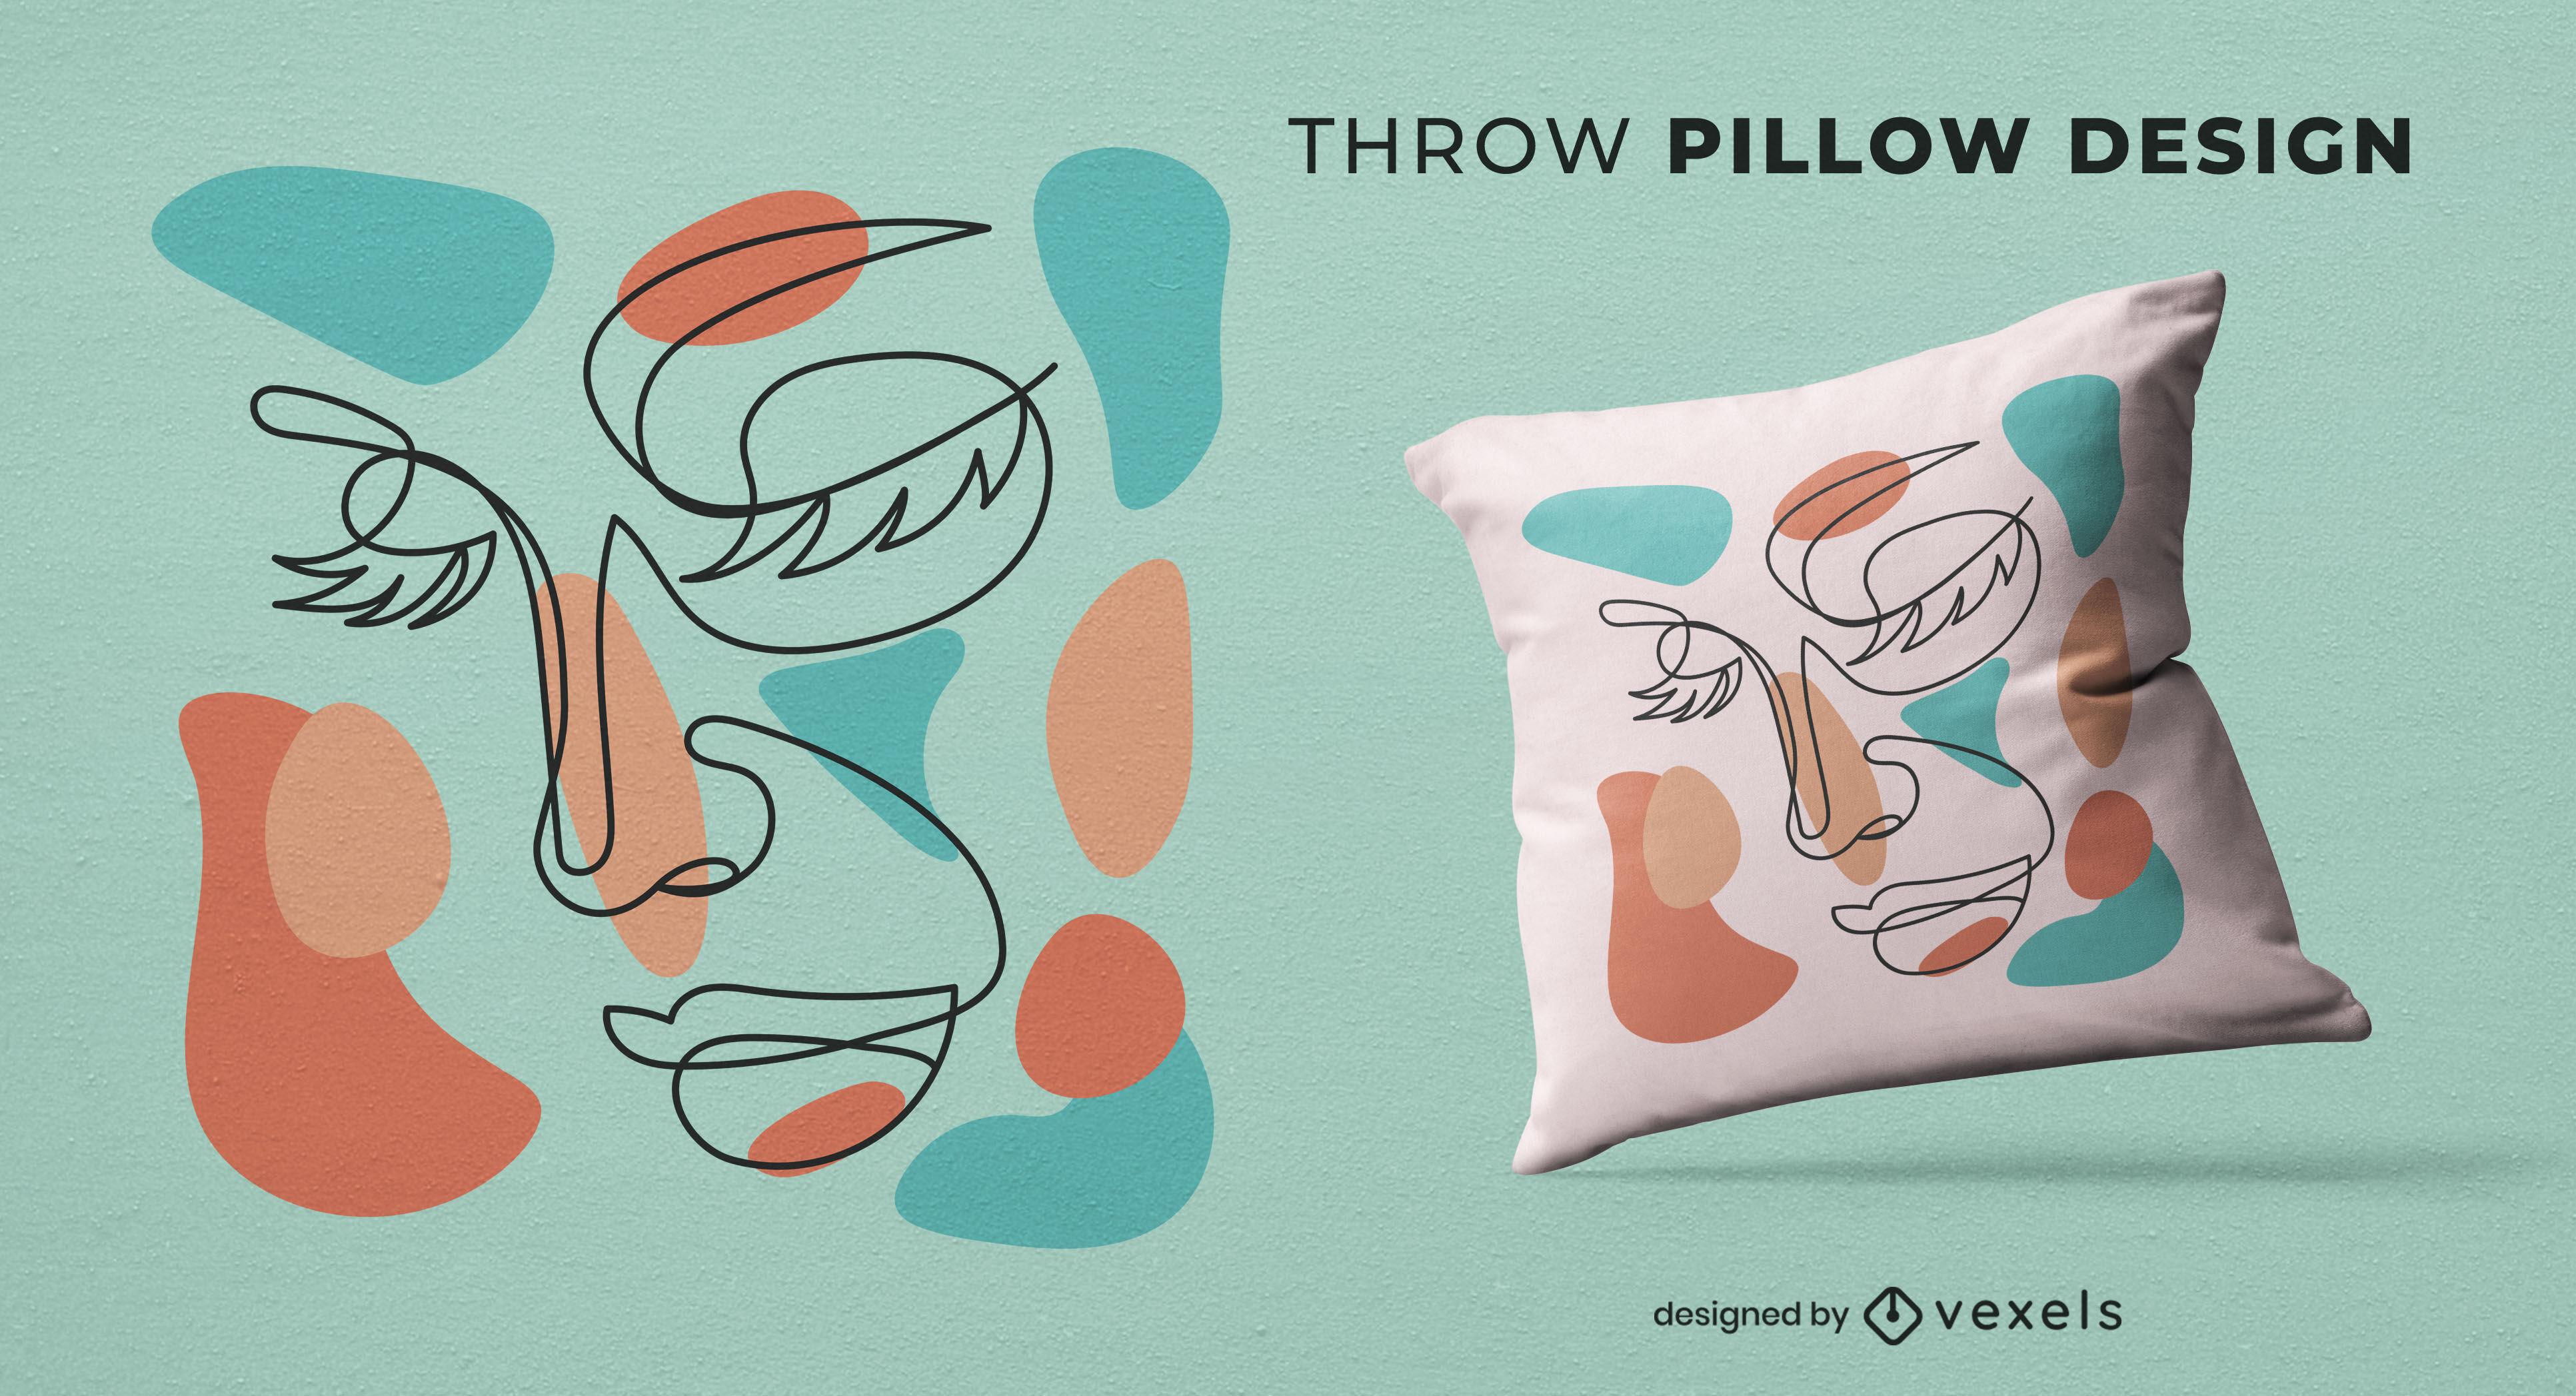 Human face abstract throw pillow design